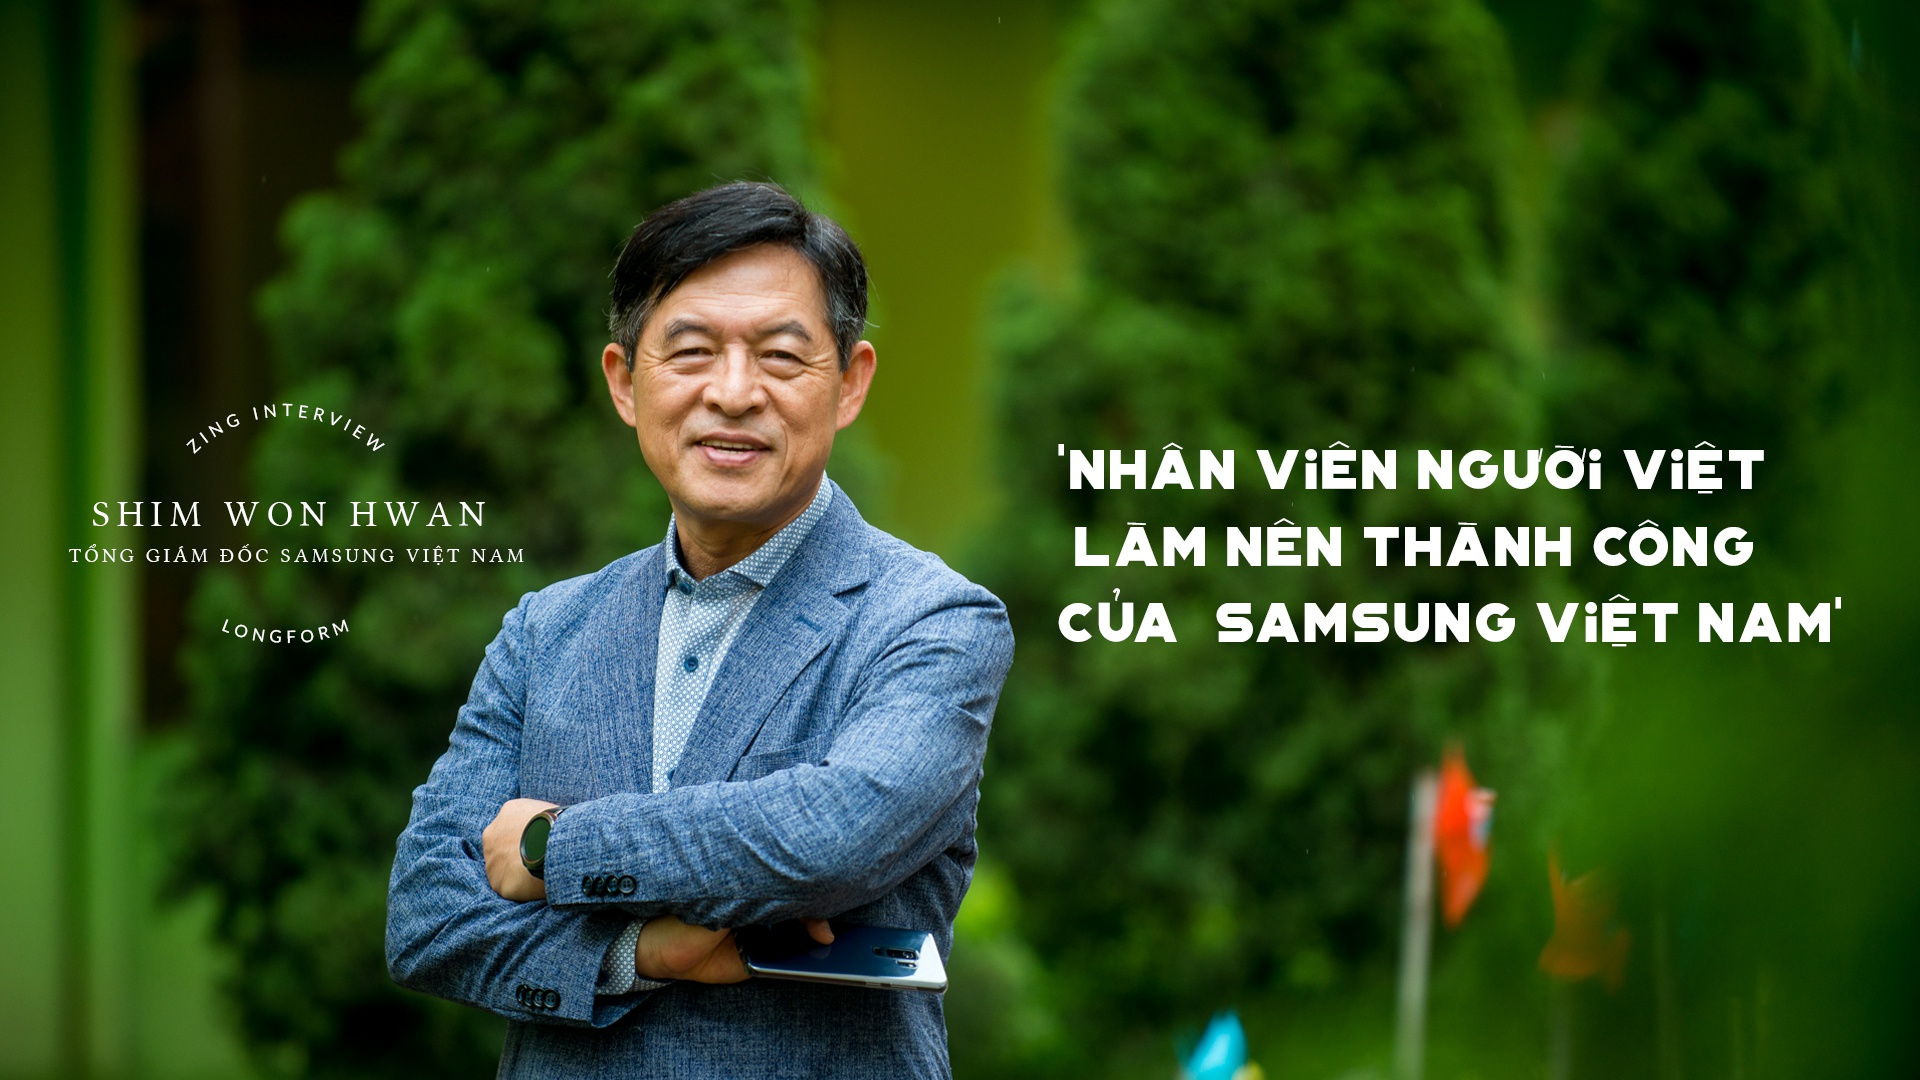 'Nhan vien nguoi Viet lam nen thanh cong cua Samsung Viet Nam' hinh anh 2